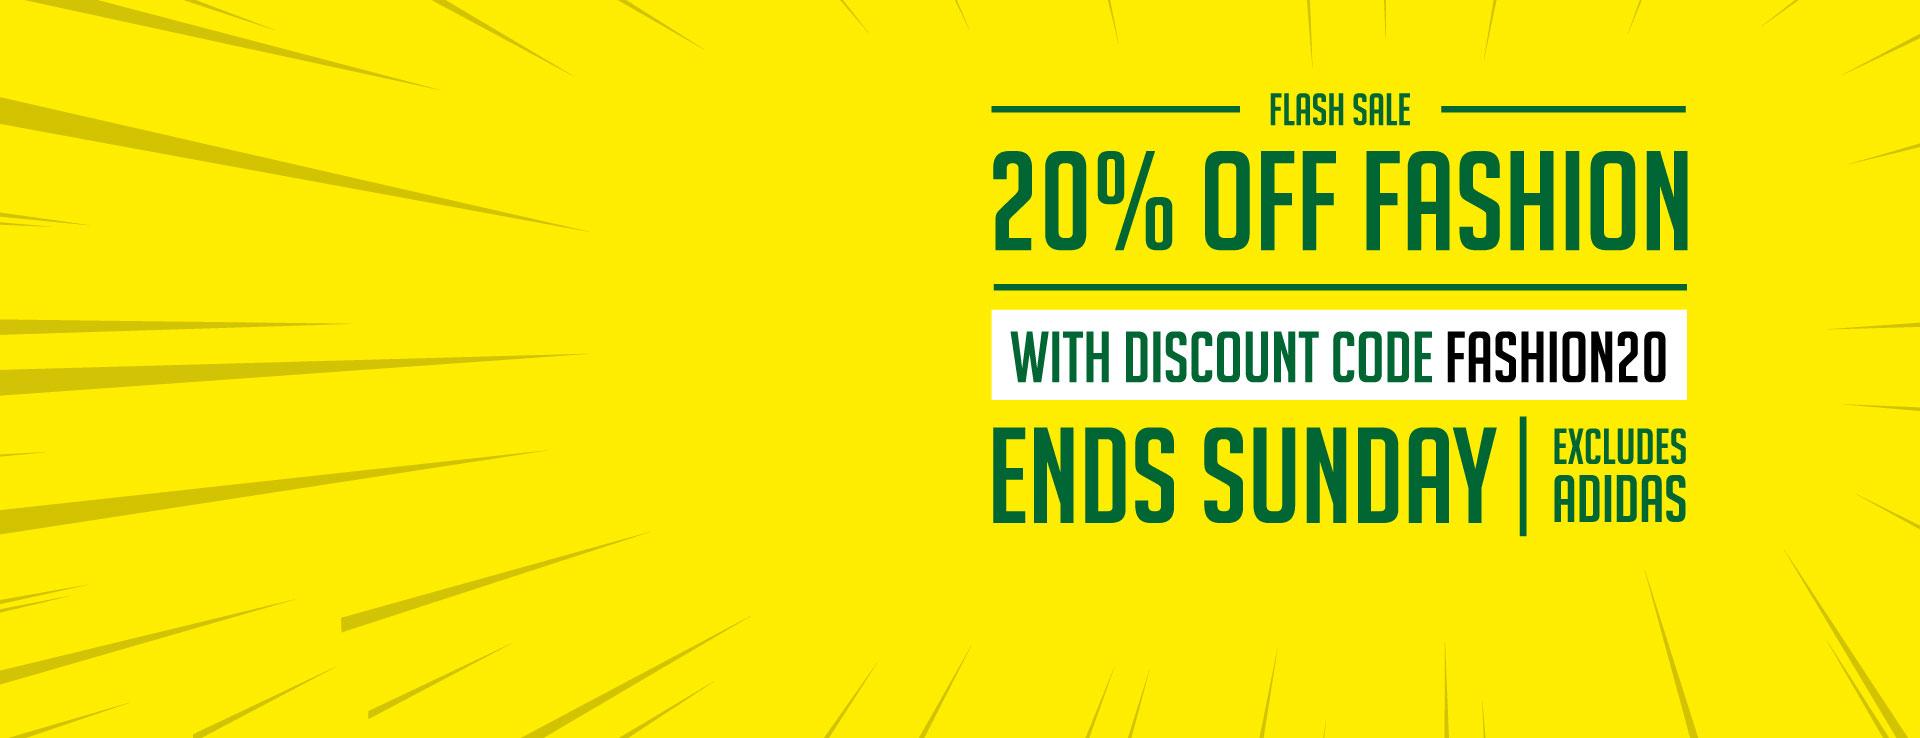 Celtic FC 20% off Fashion Flash Sale